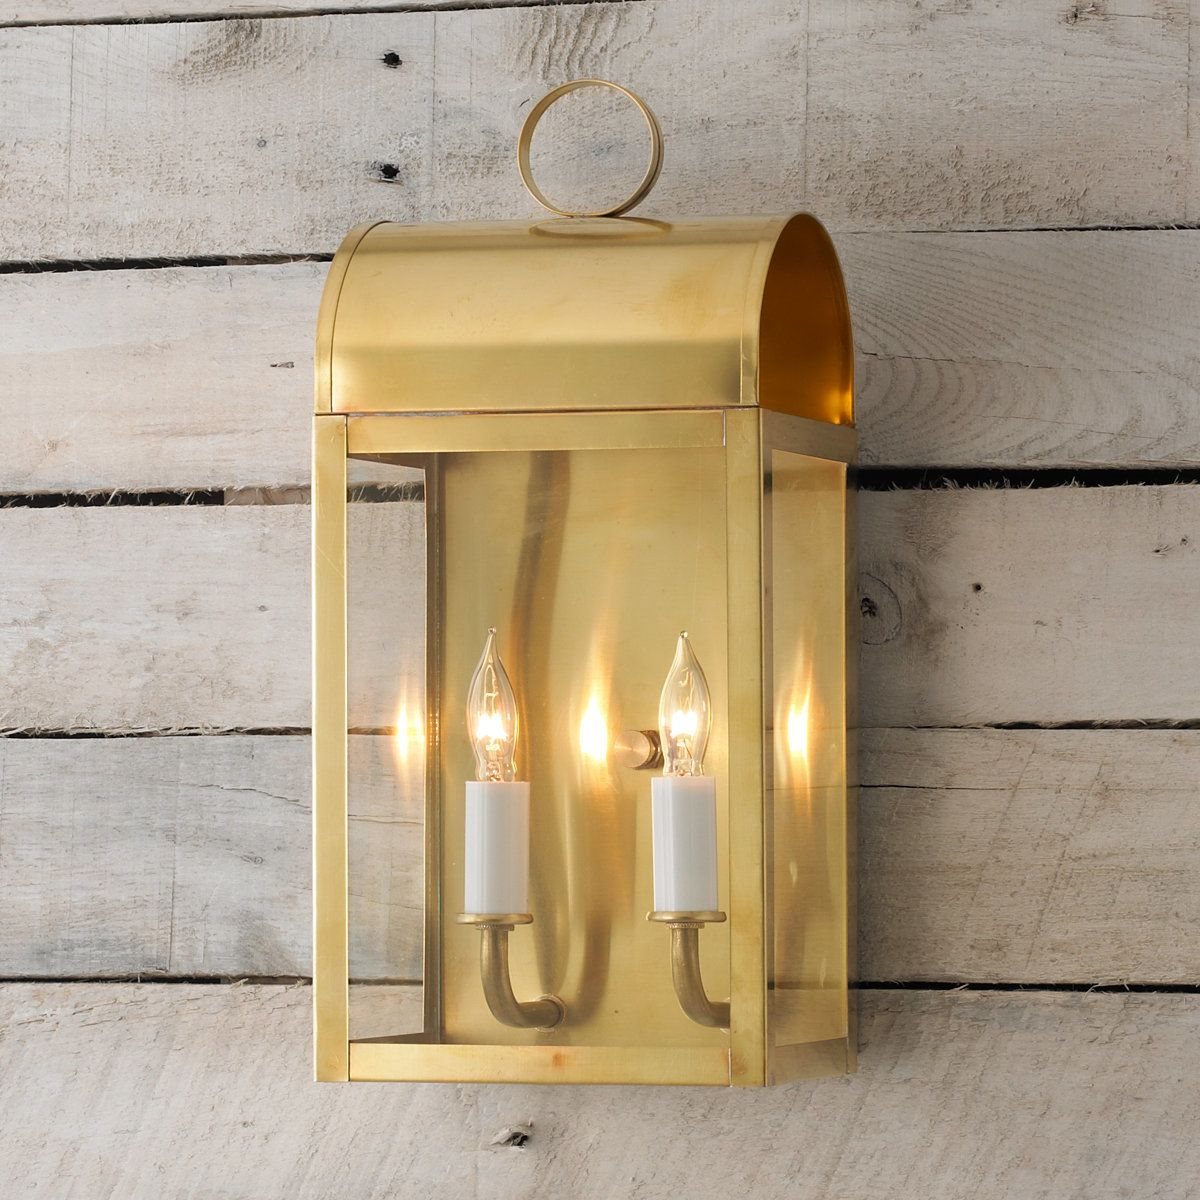 Arched Outdoor Light - 2 Light | Lights